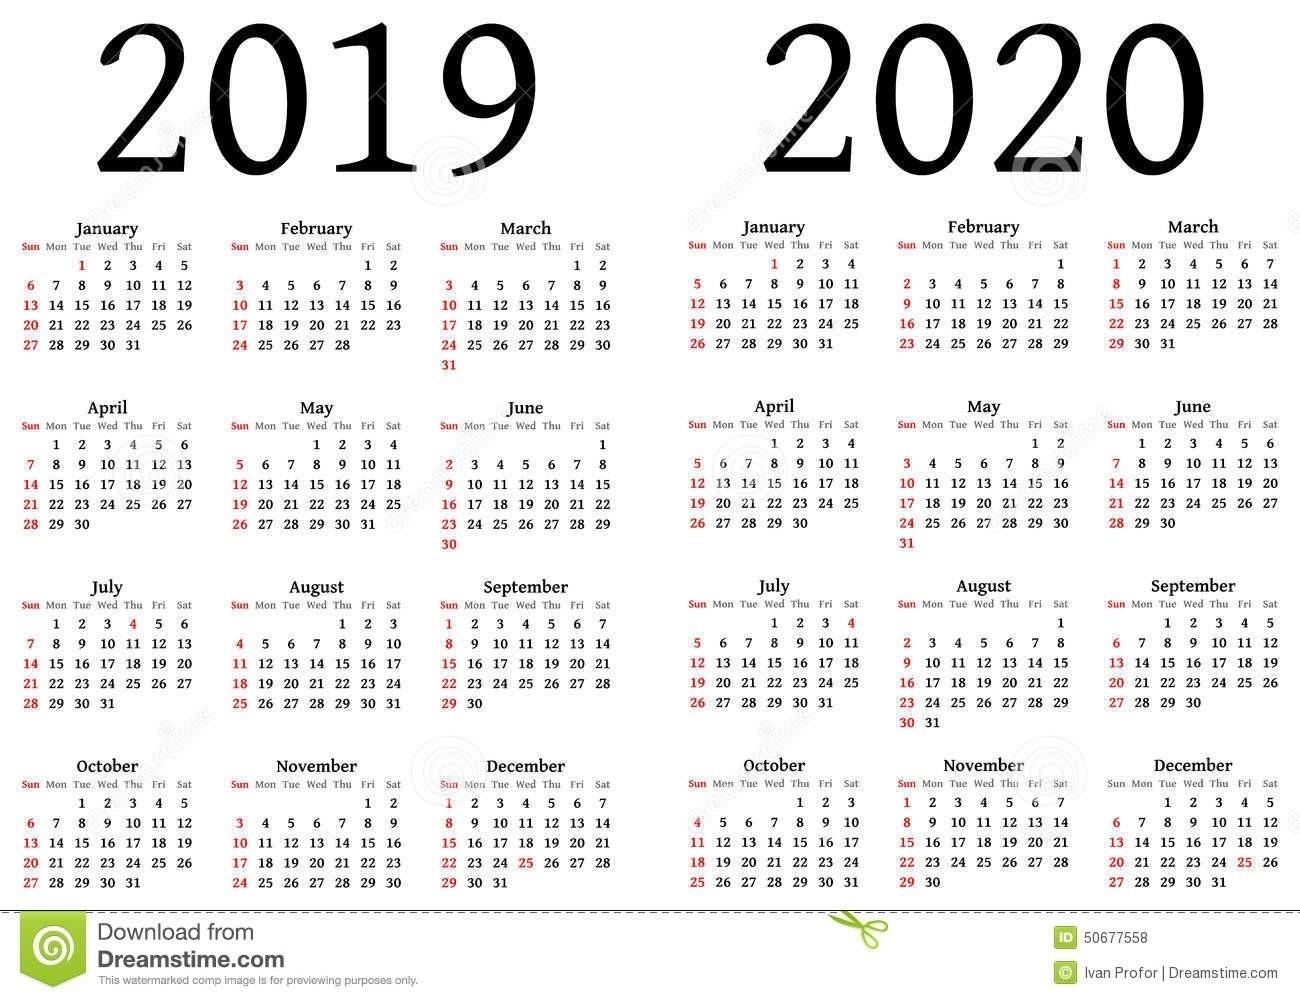 Large Calendar 2019/2020 - Calendar Inspiration Design  Depo-Provera Calendar 2021